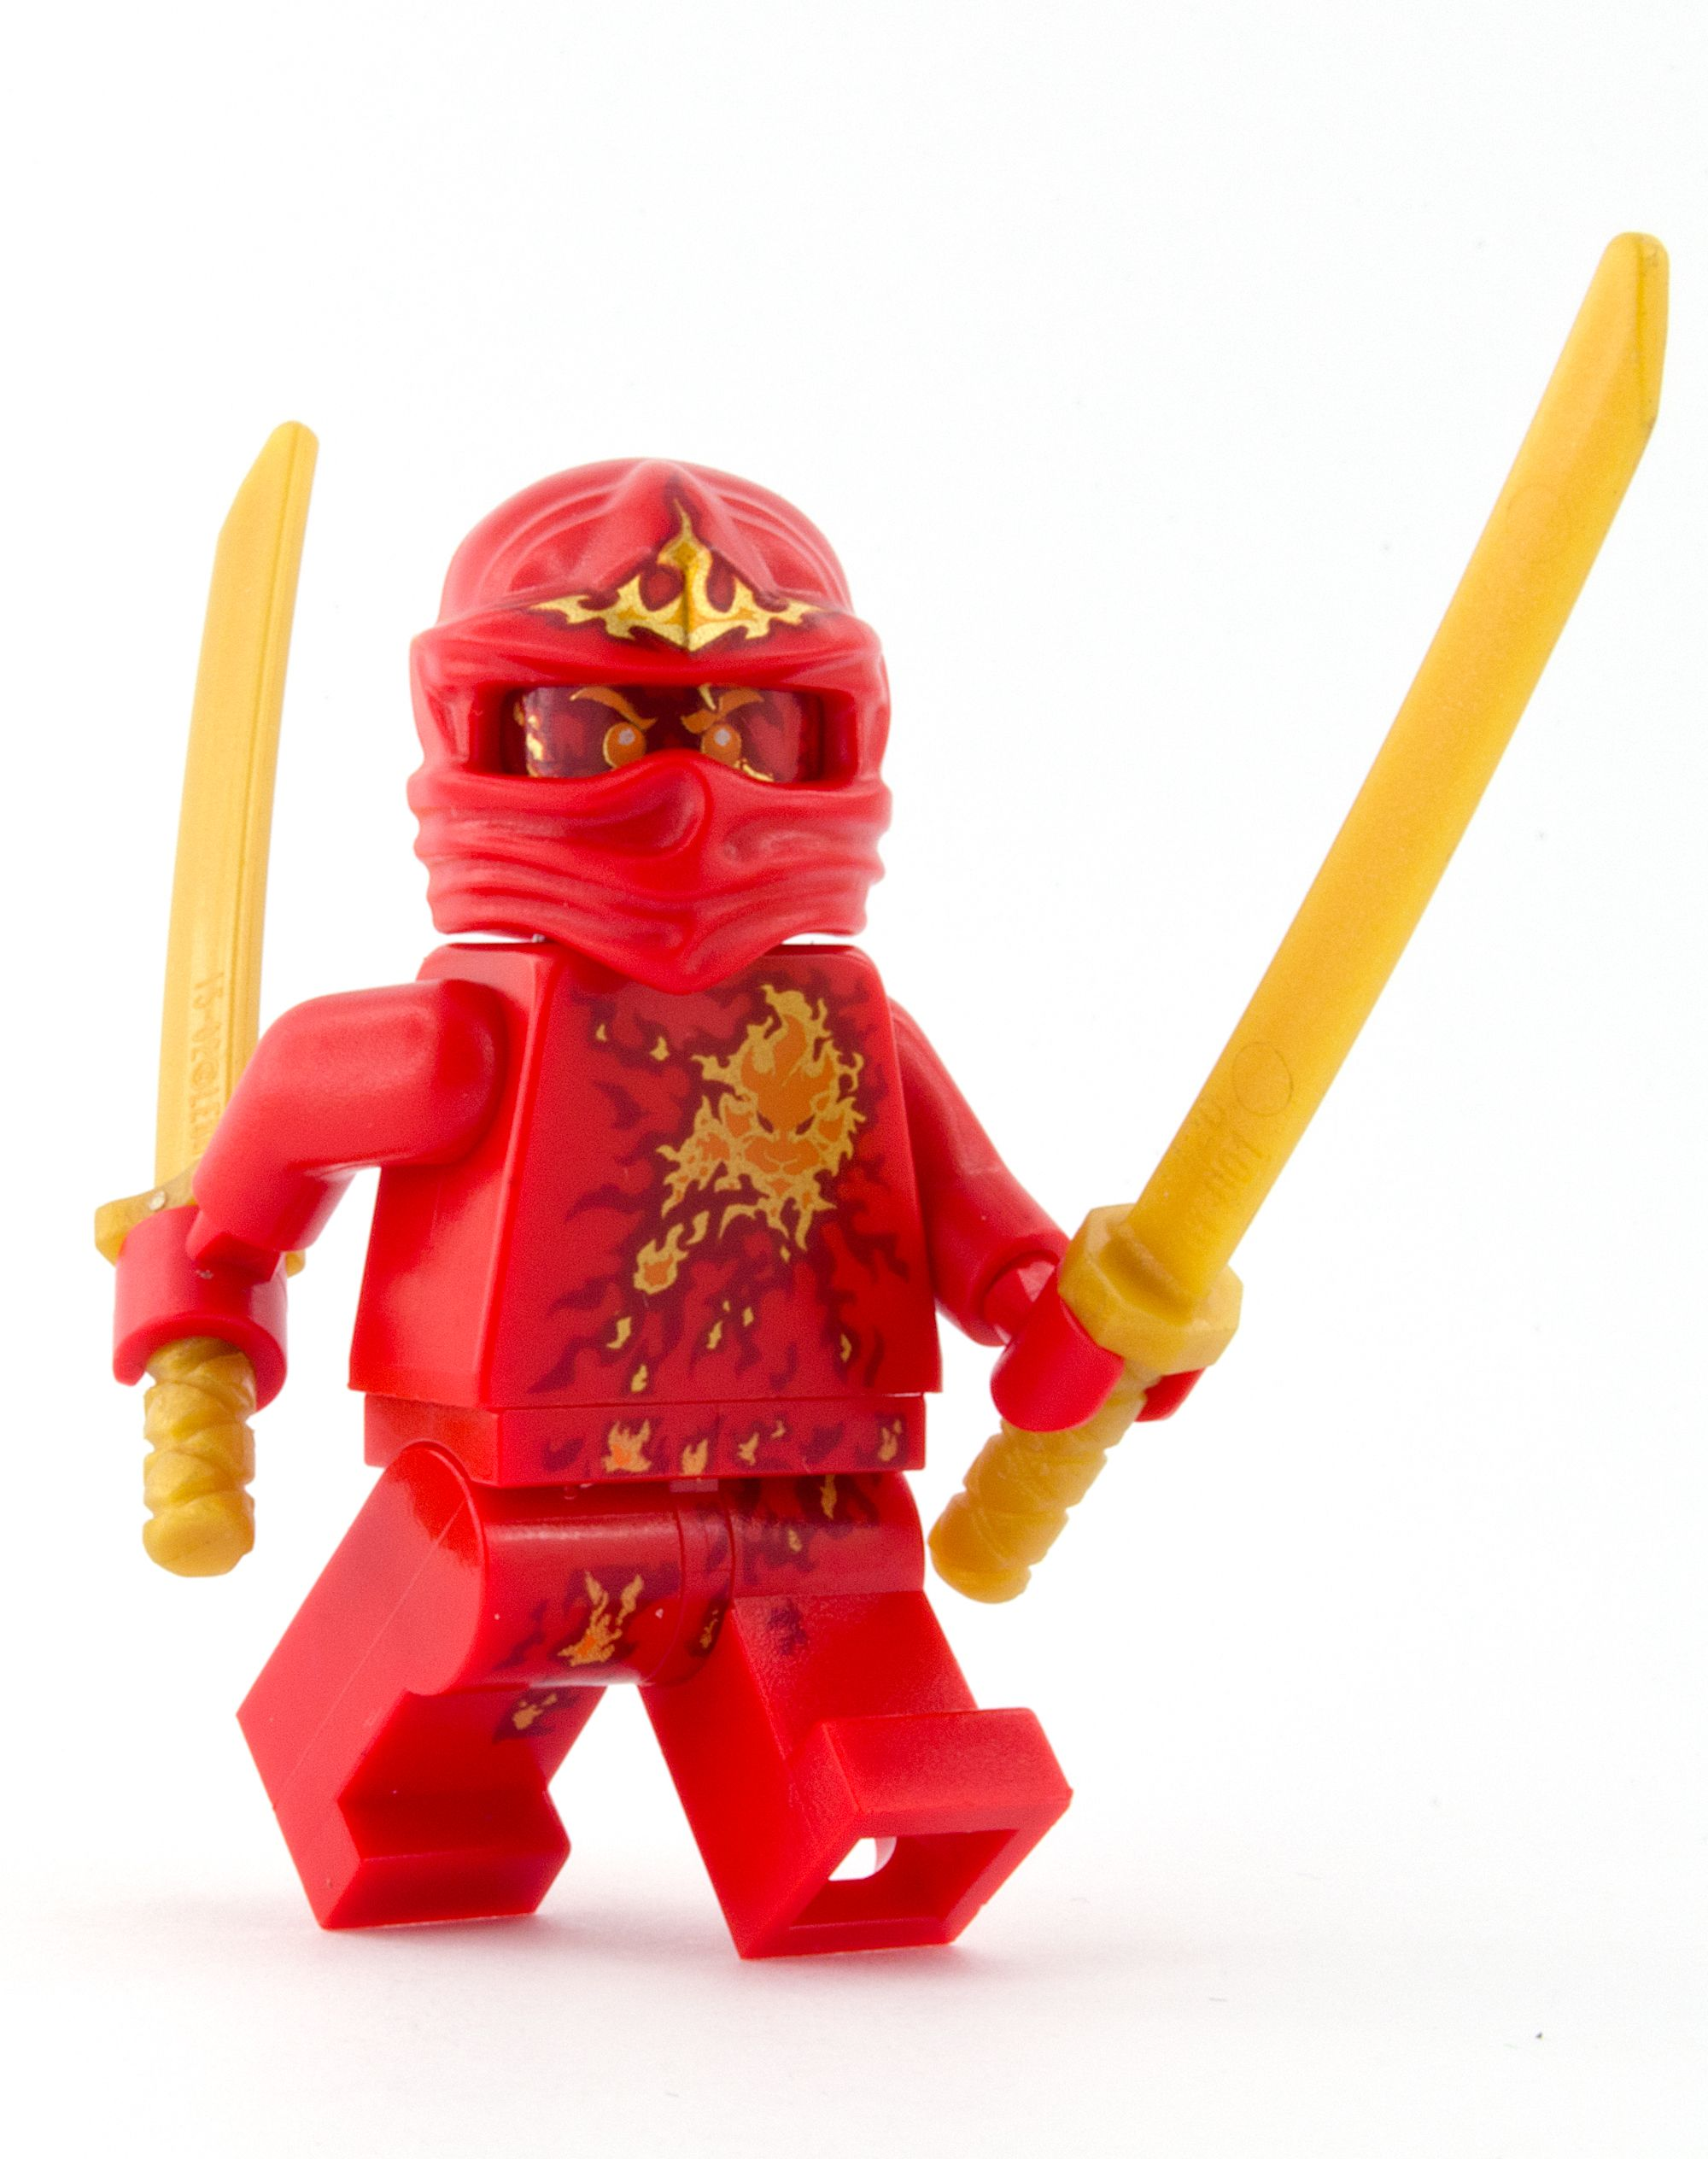 Lego ninjago kai google search my little guy 39 s - Ninjago lego kai ...